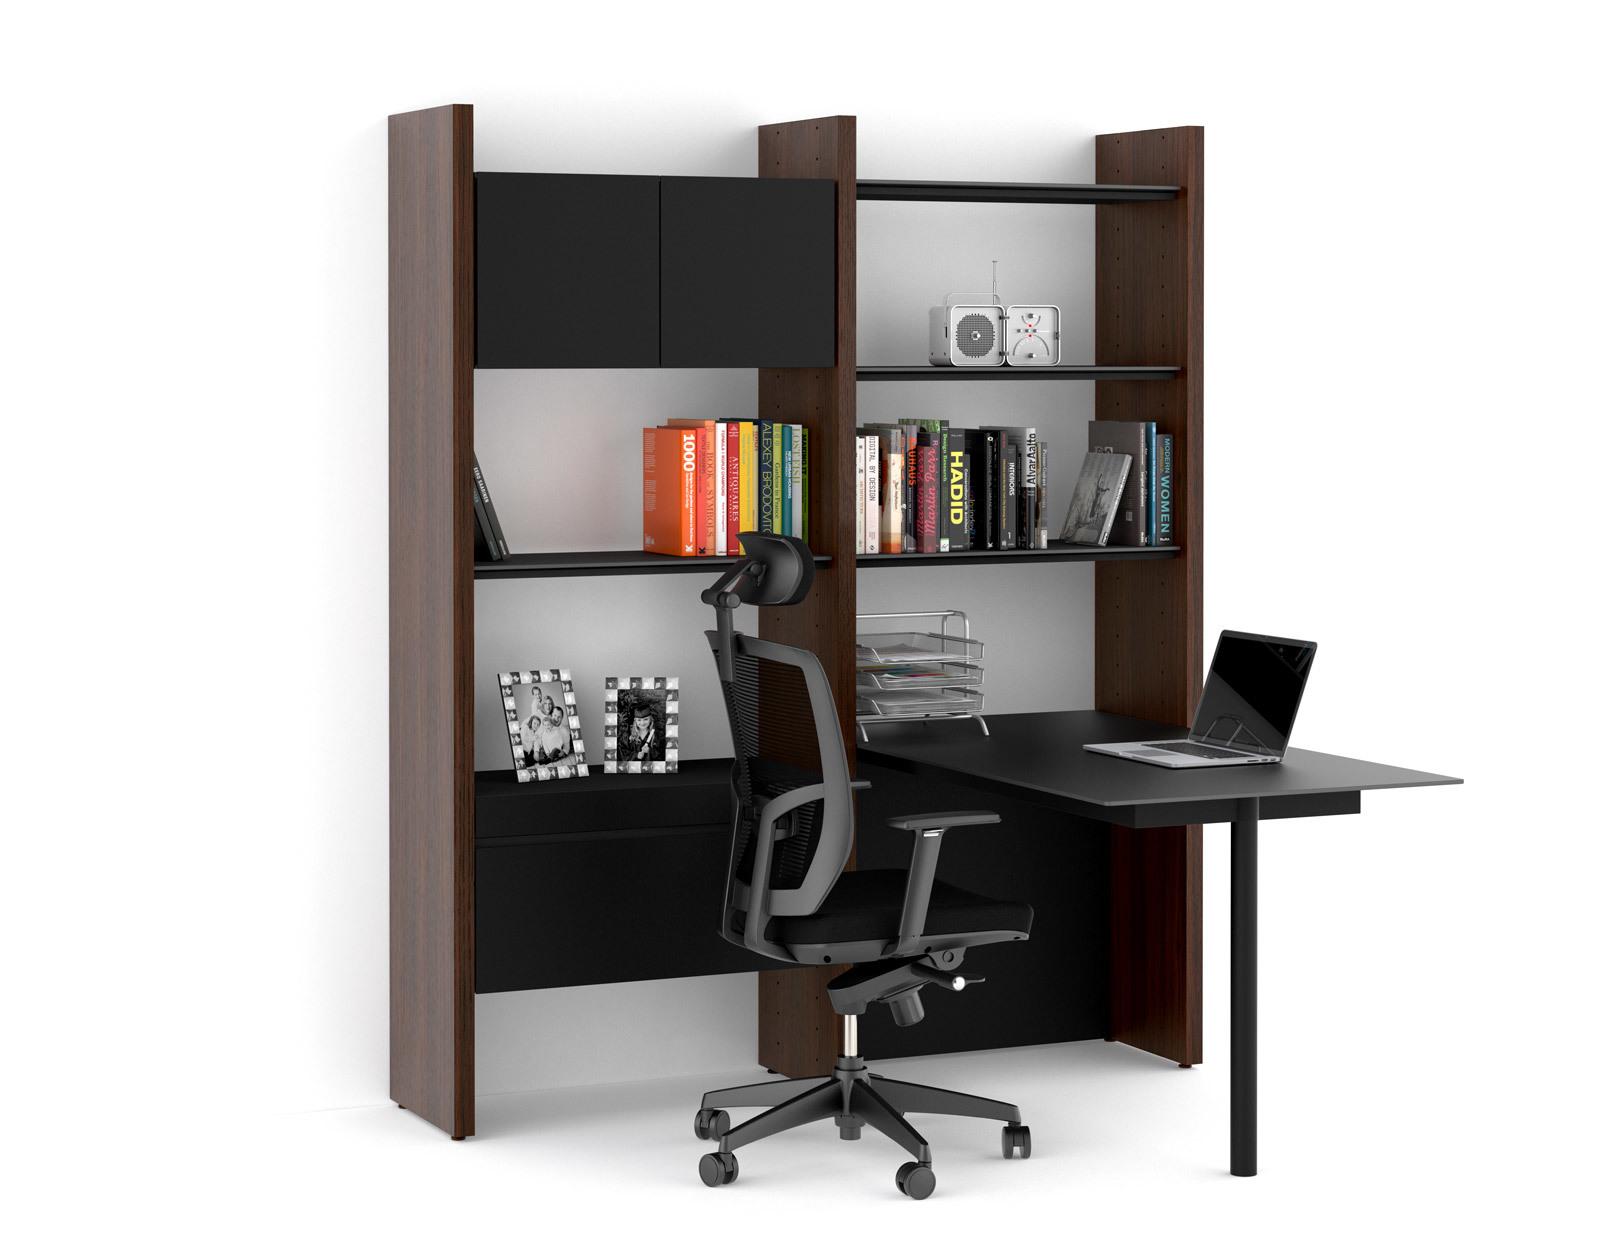 online office design tool. Semblance 5413-PN. \u201c Online Office Design Tool E